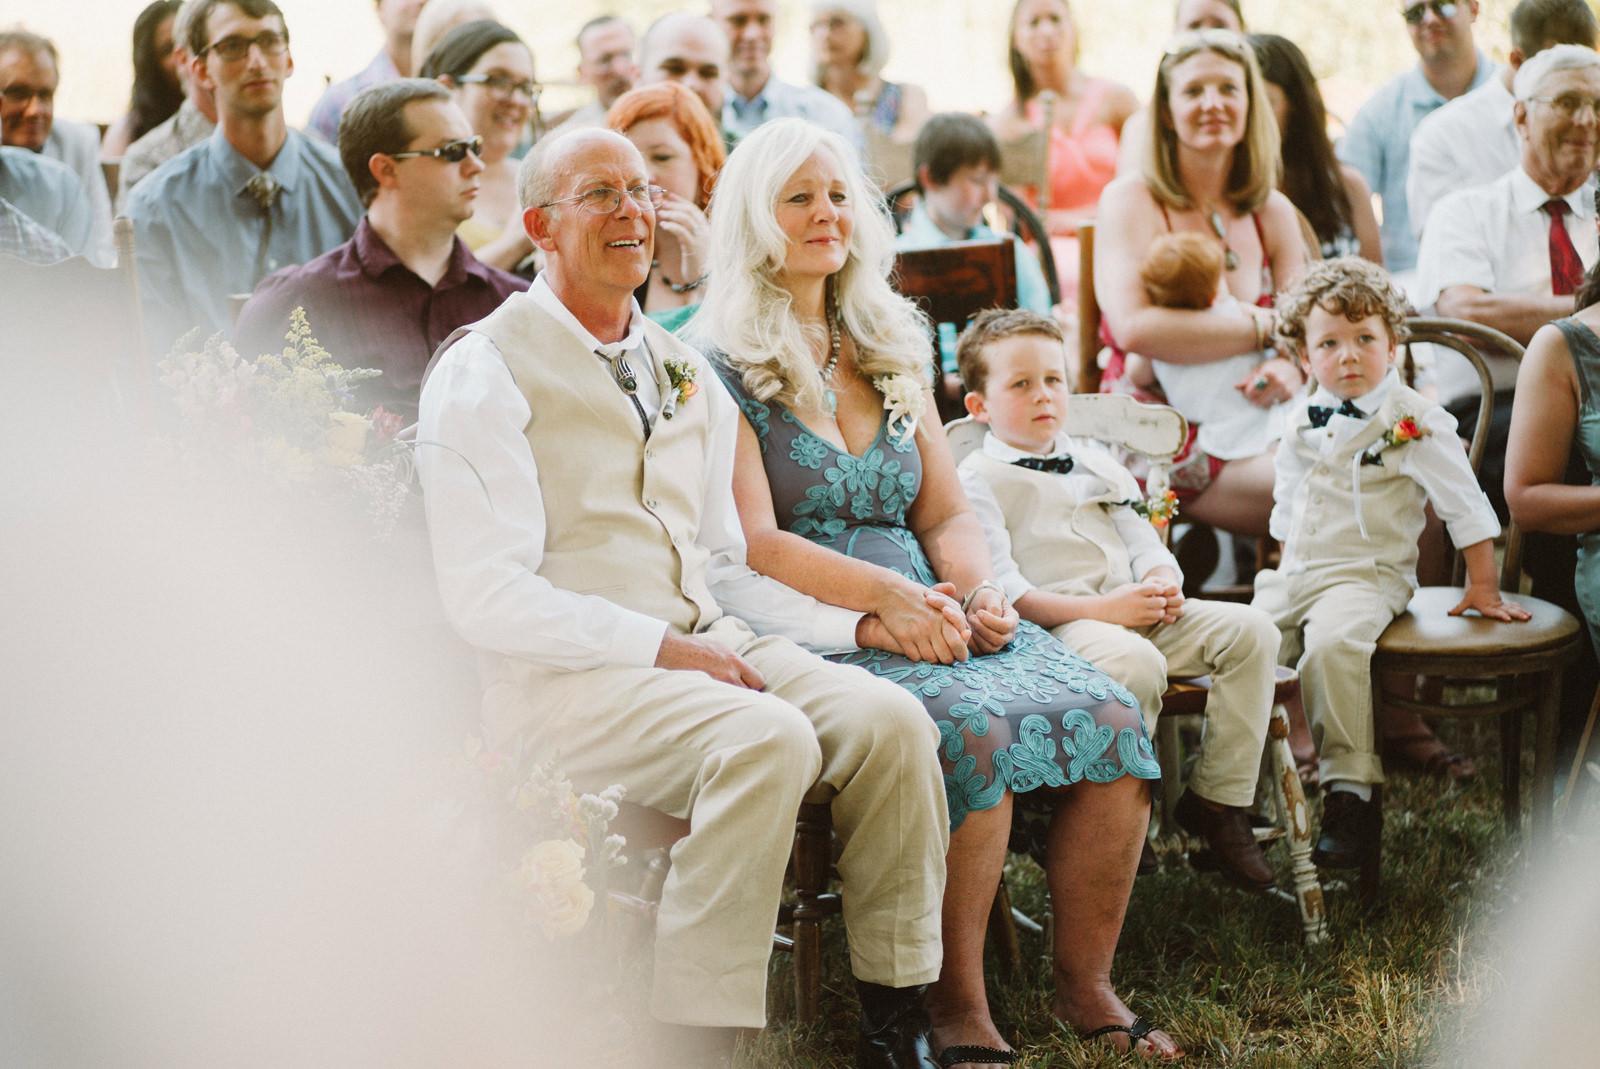 rivers-bend-retreat-wedding-028 RIVER'S BEND RETREAT WEDDING